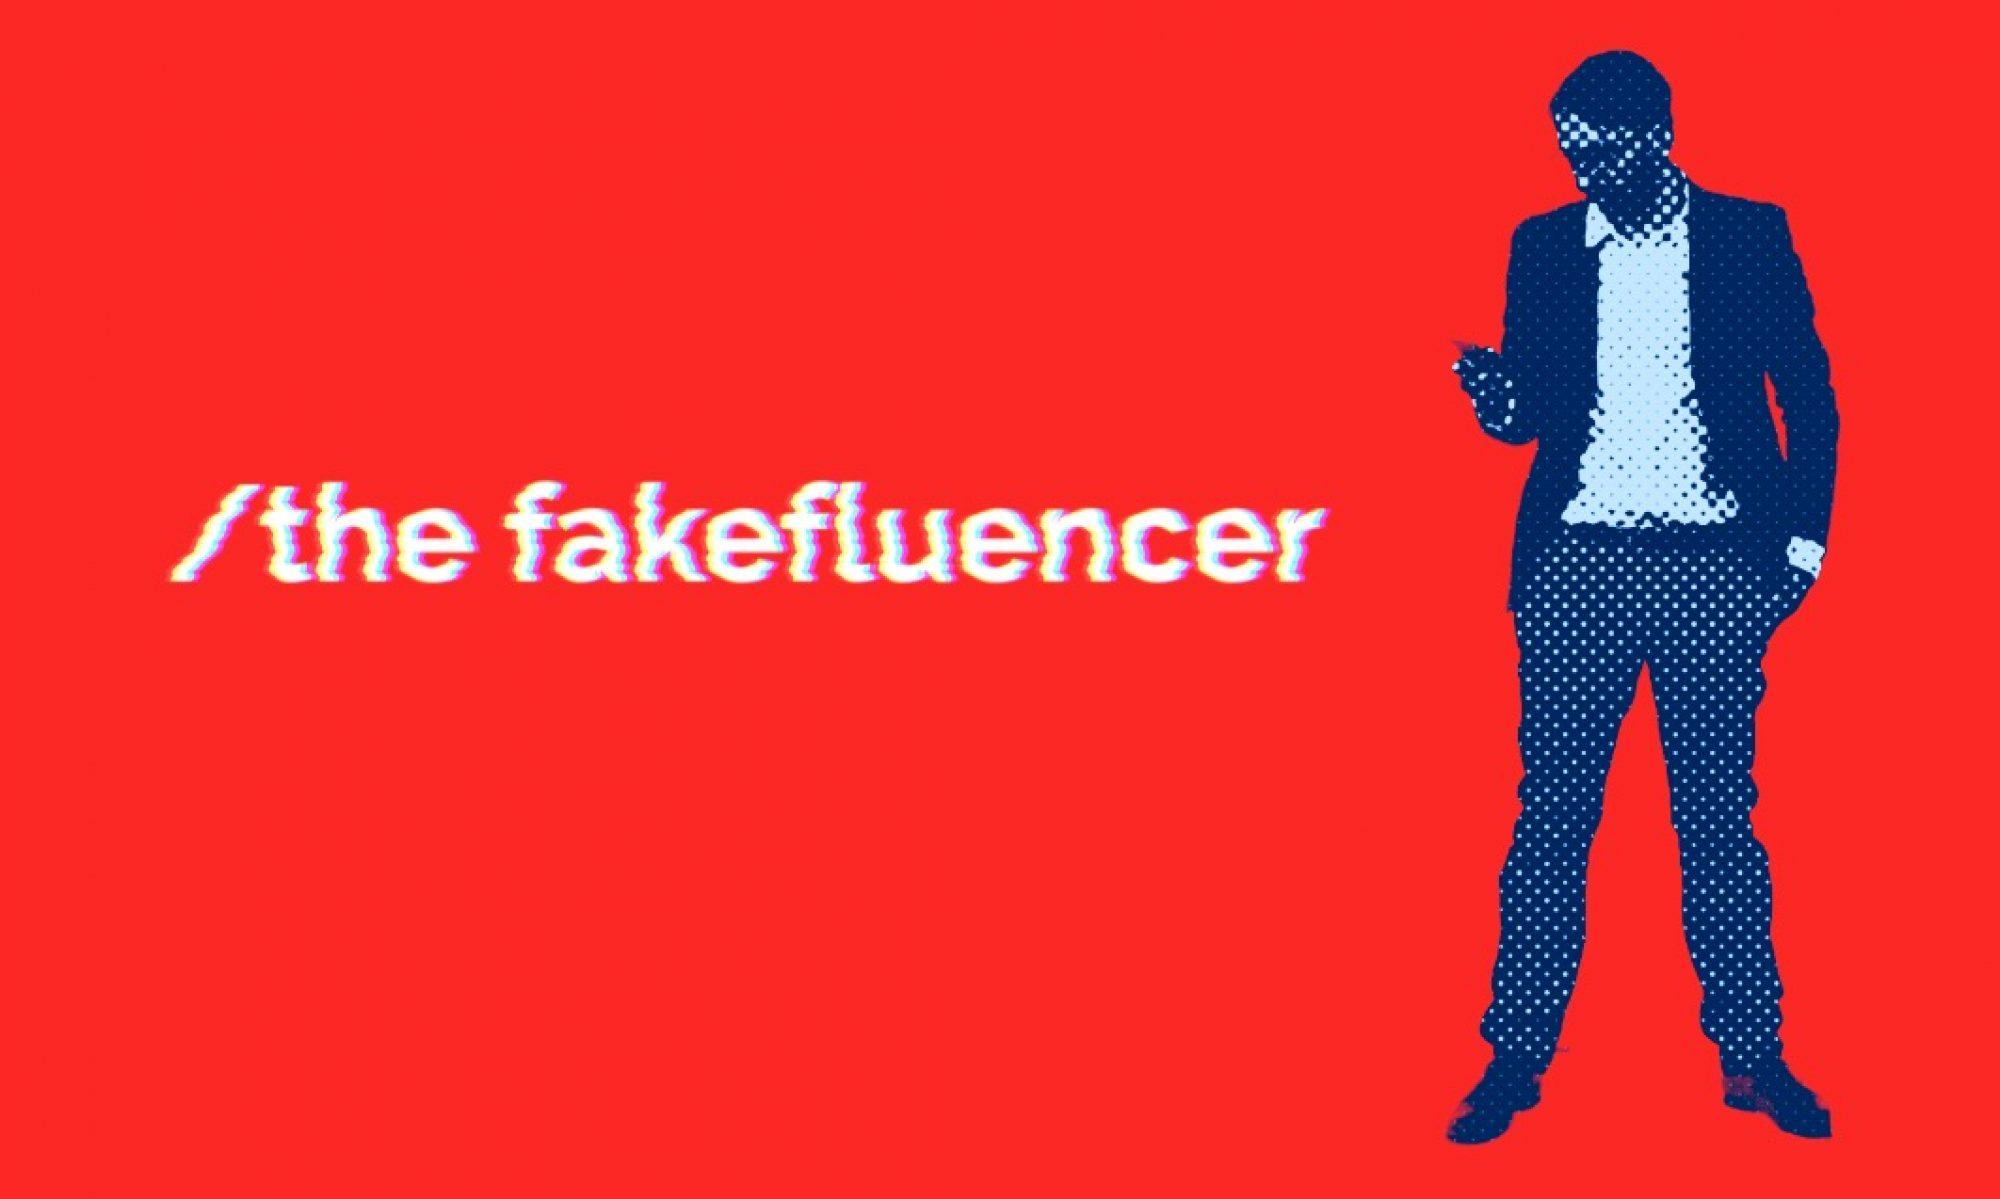 The Fakefluencer Movie